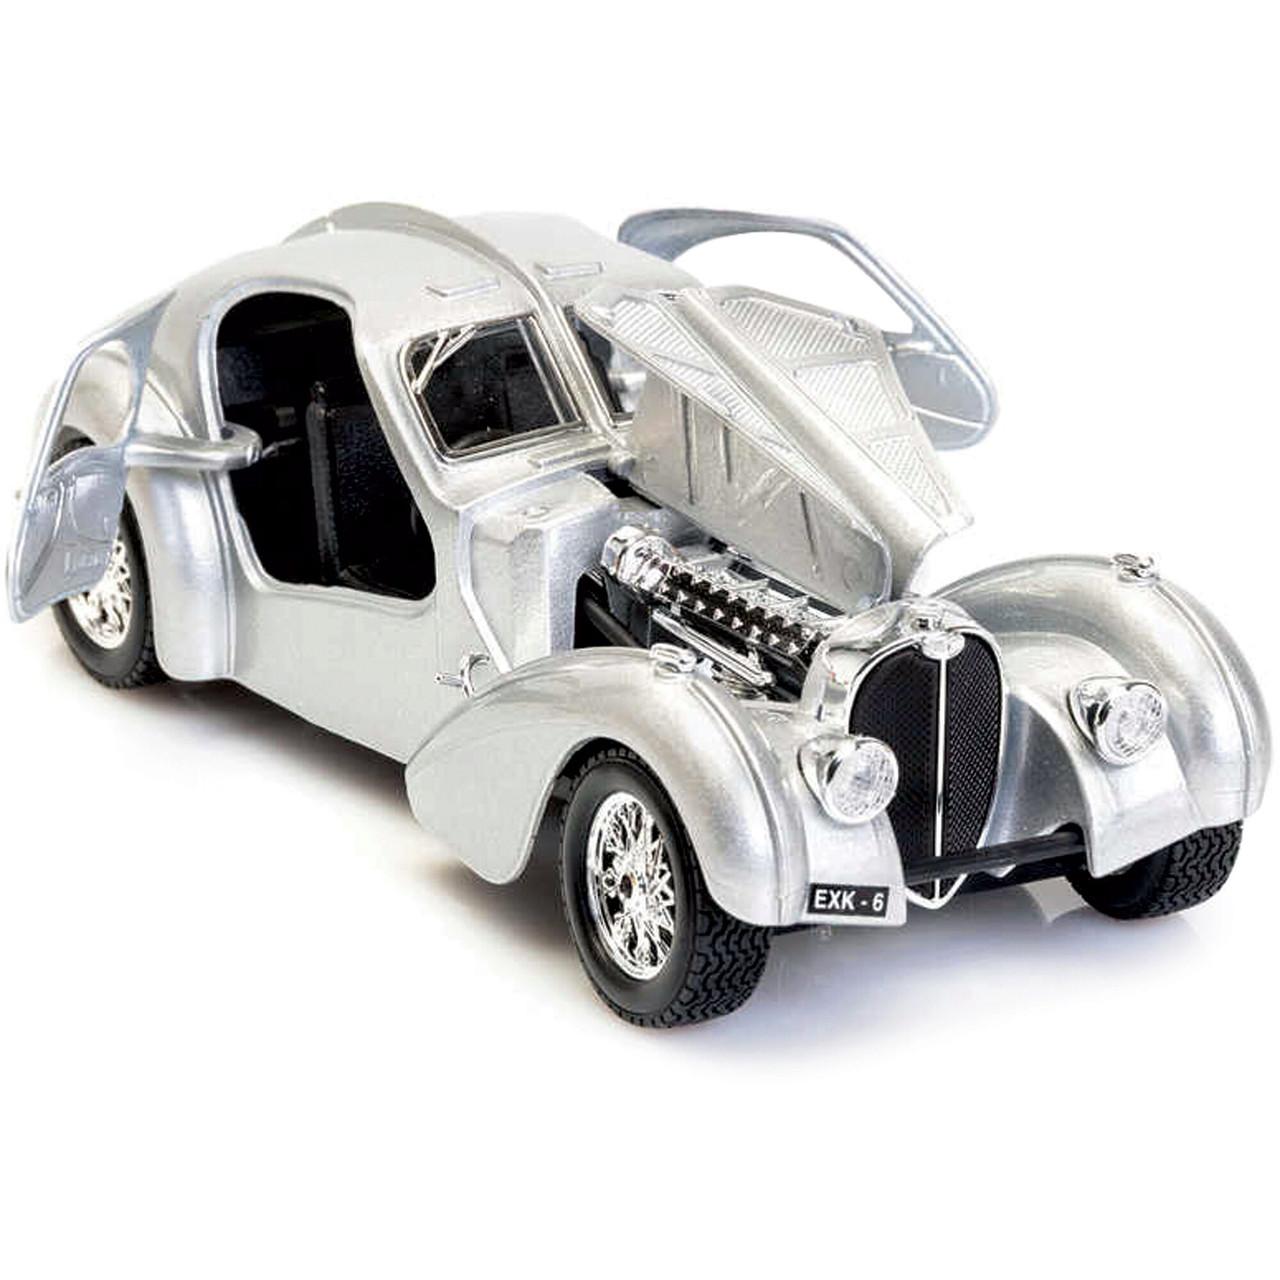 BUGATTI ATLANTIC 1:24 Scale Diecast Model Car Burago Team Collector Toy Gift Box